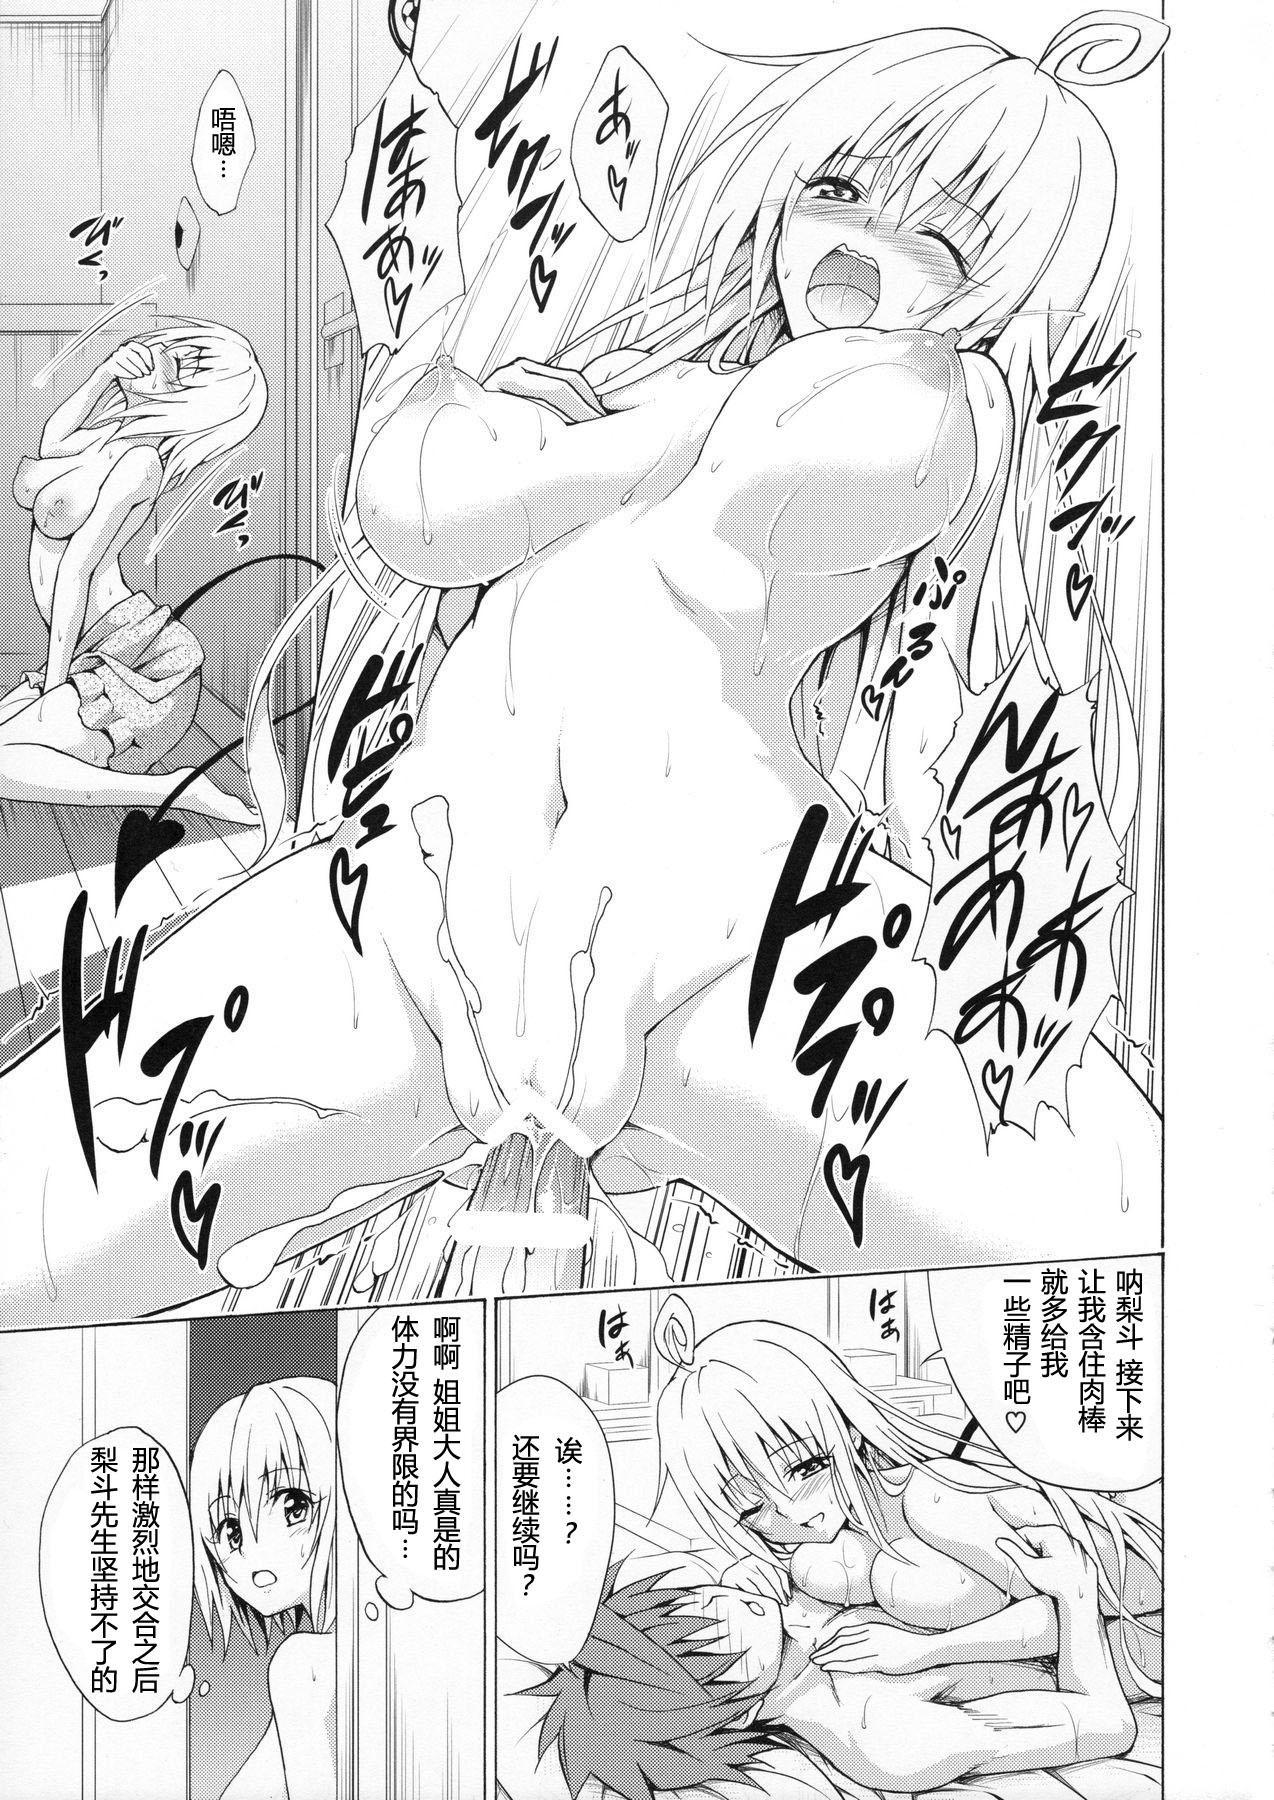 Mezase! Rakuen Keikaku Vol. 1 10